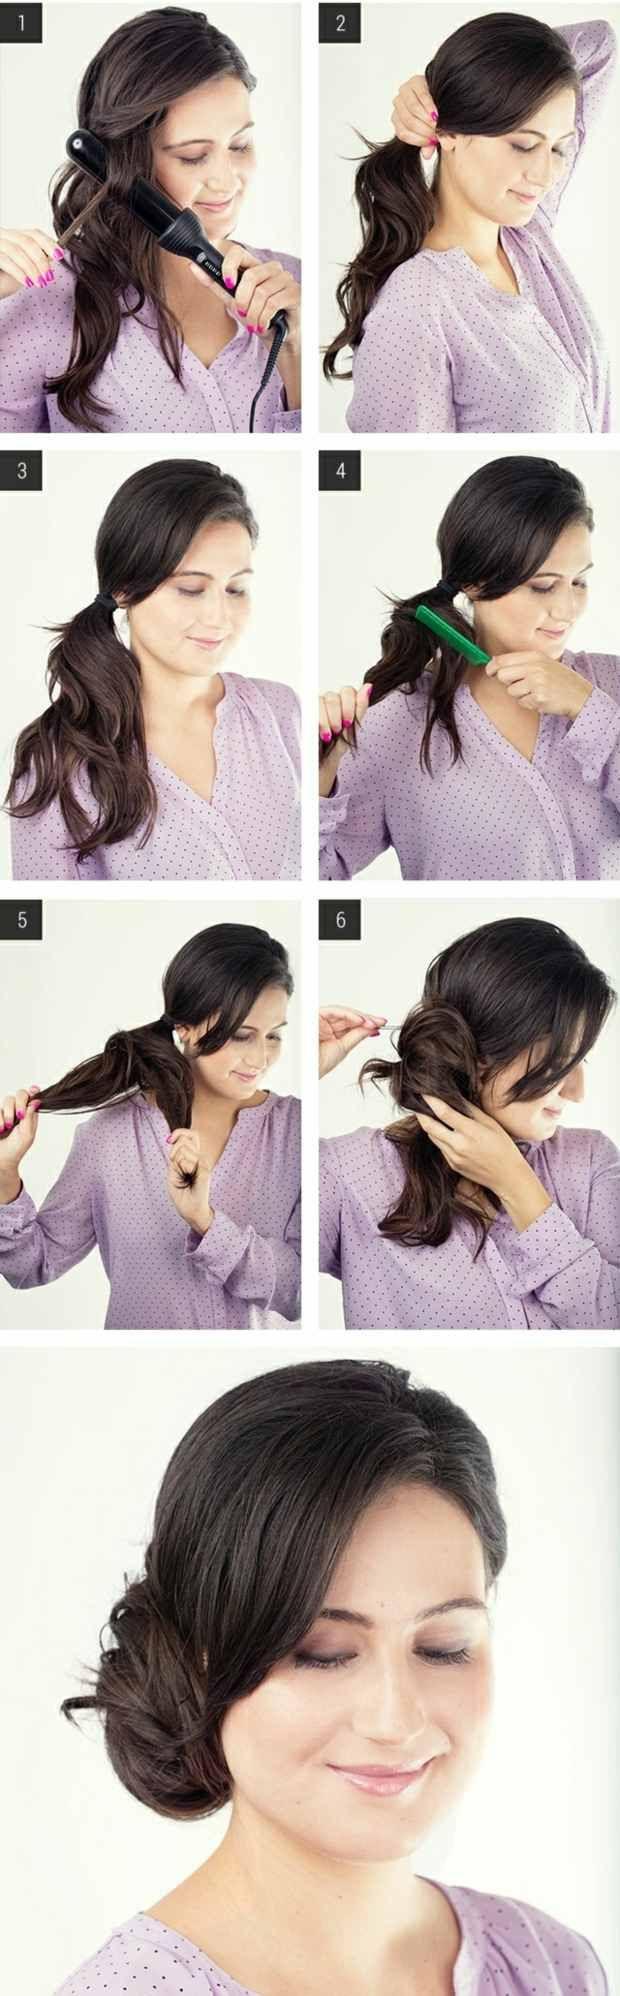 Frisur seitlicher dutt anleitung